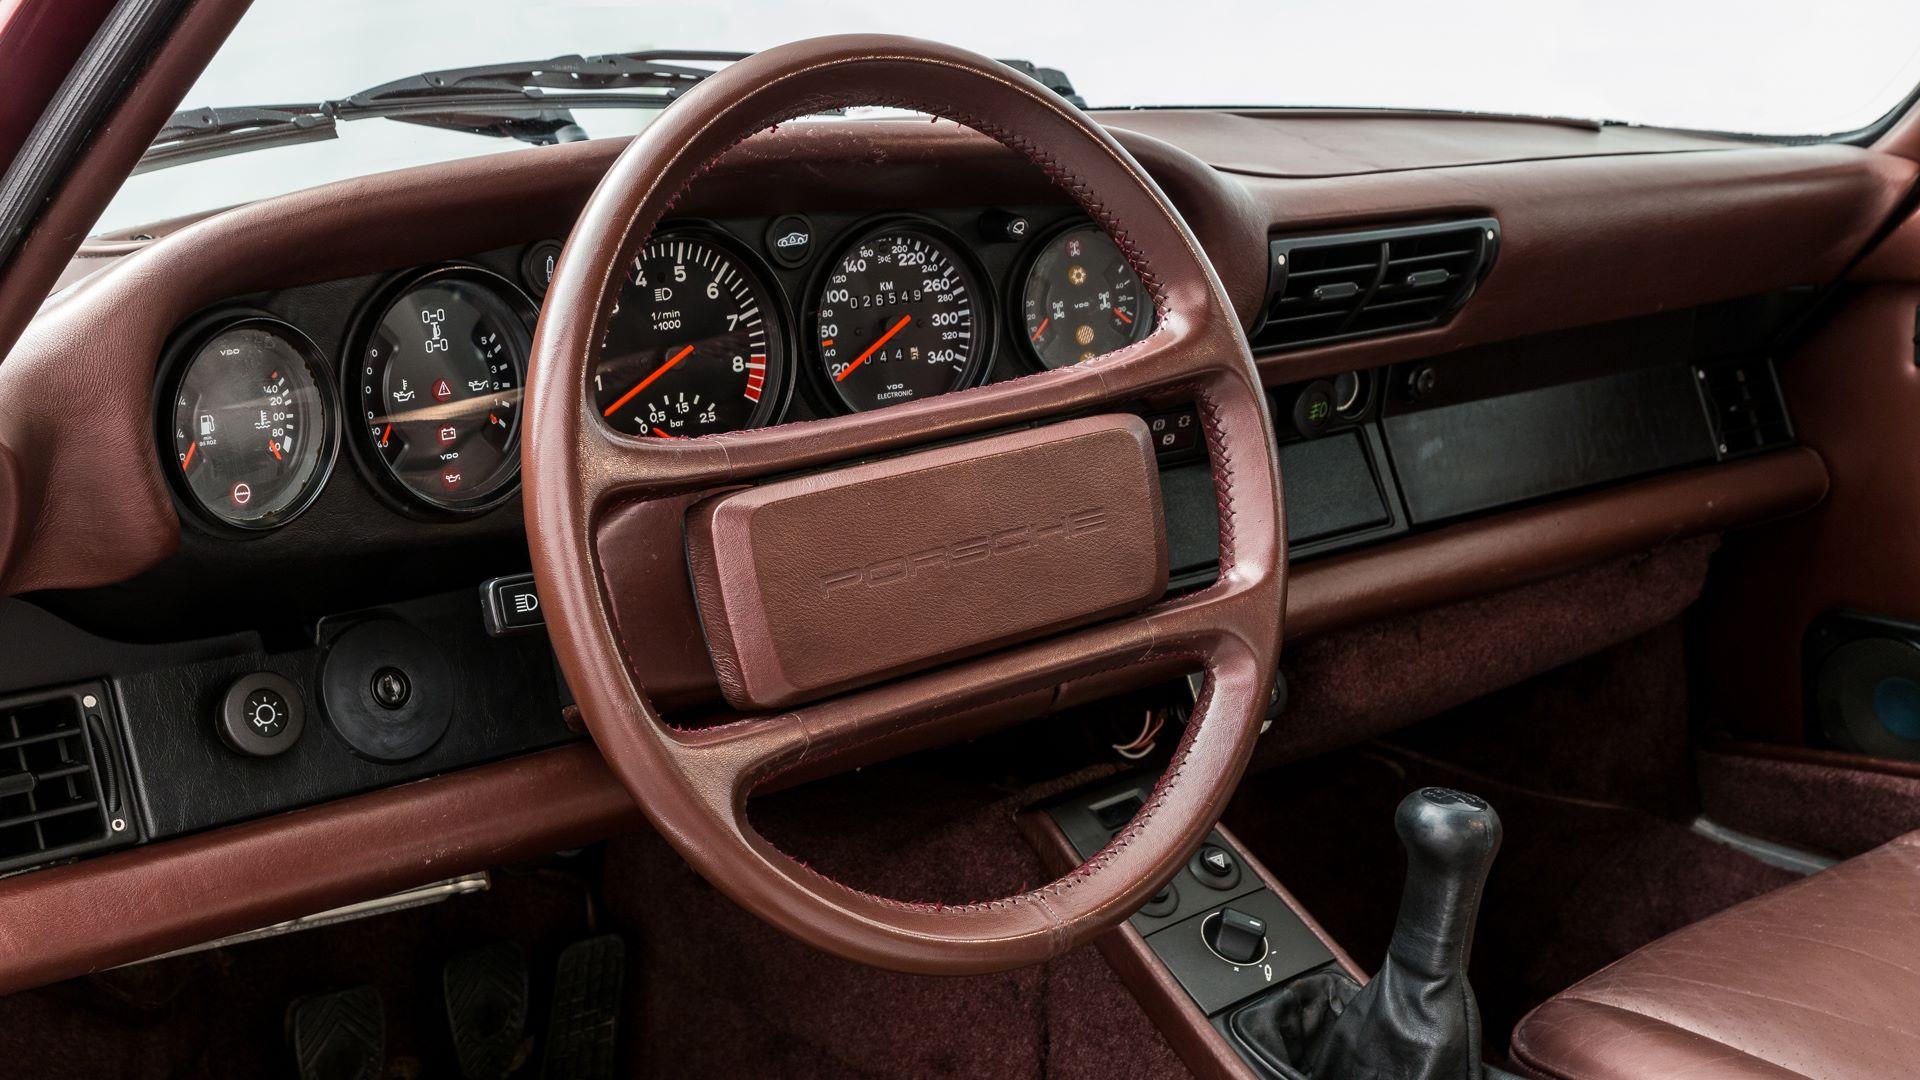 Porsche-959-Prototype-1985-for-sale-11